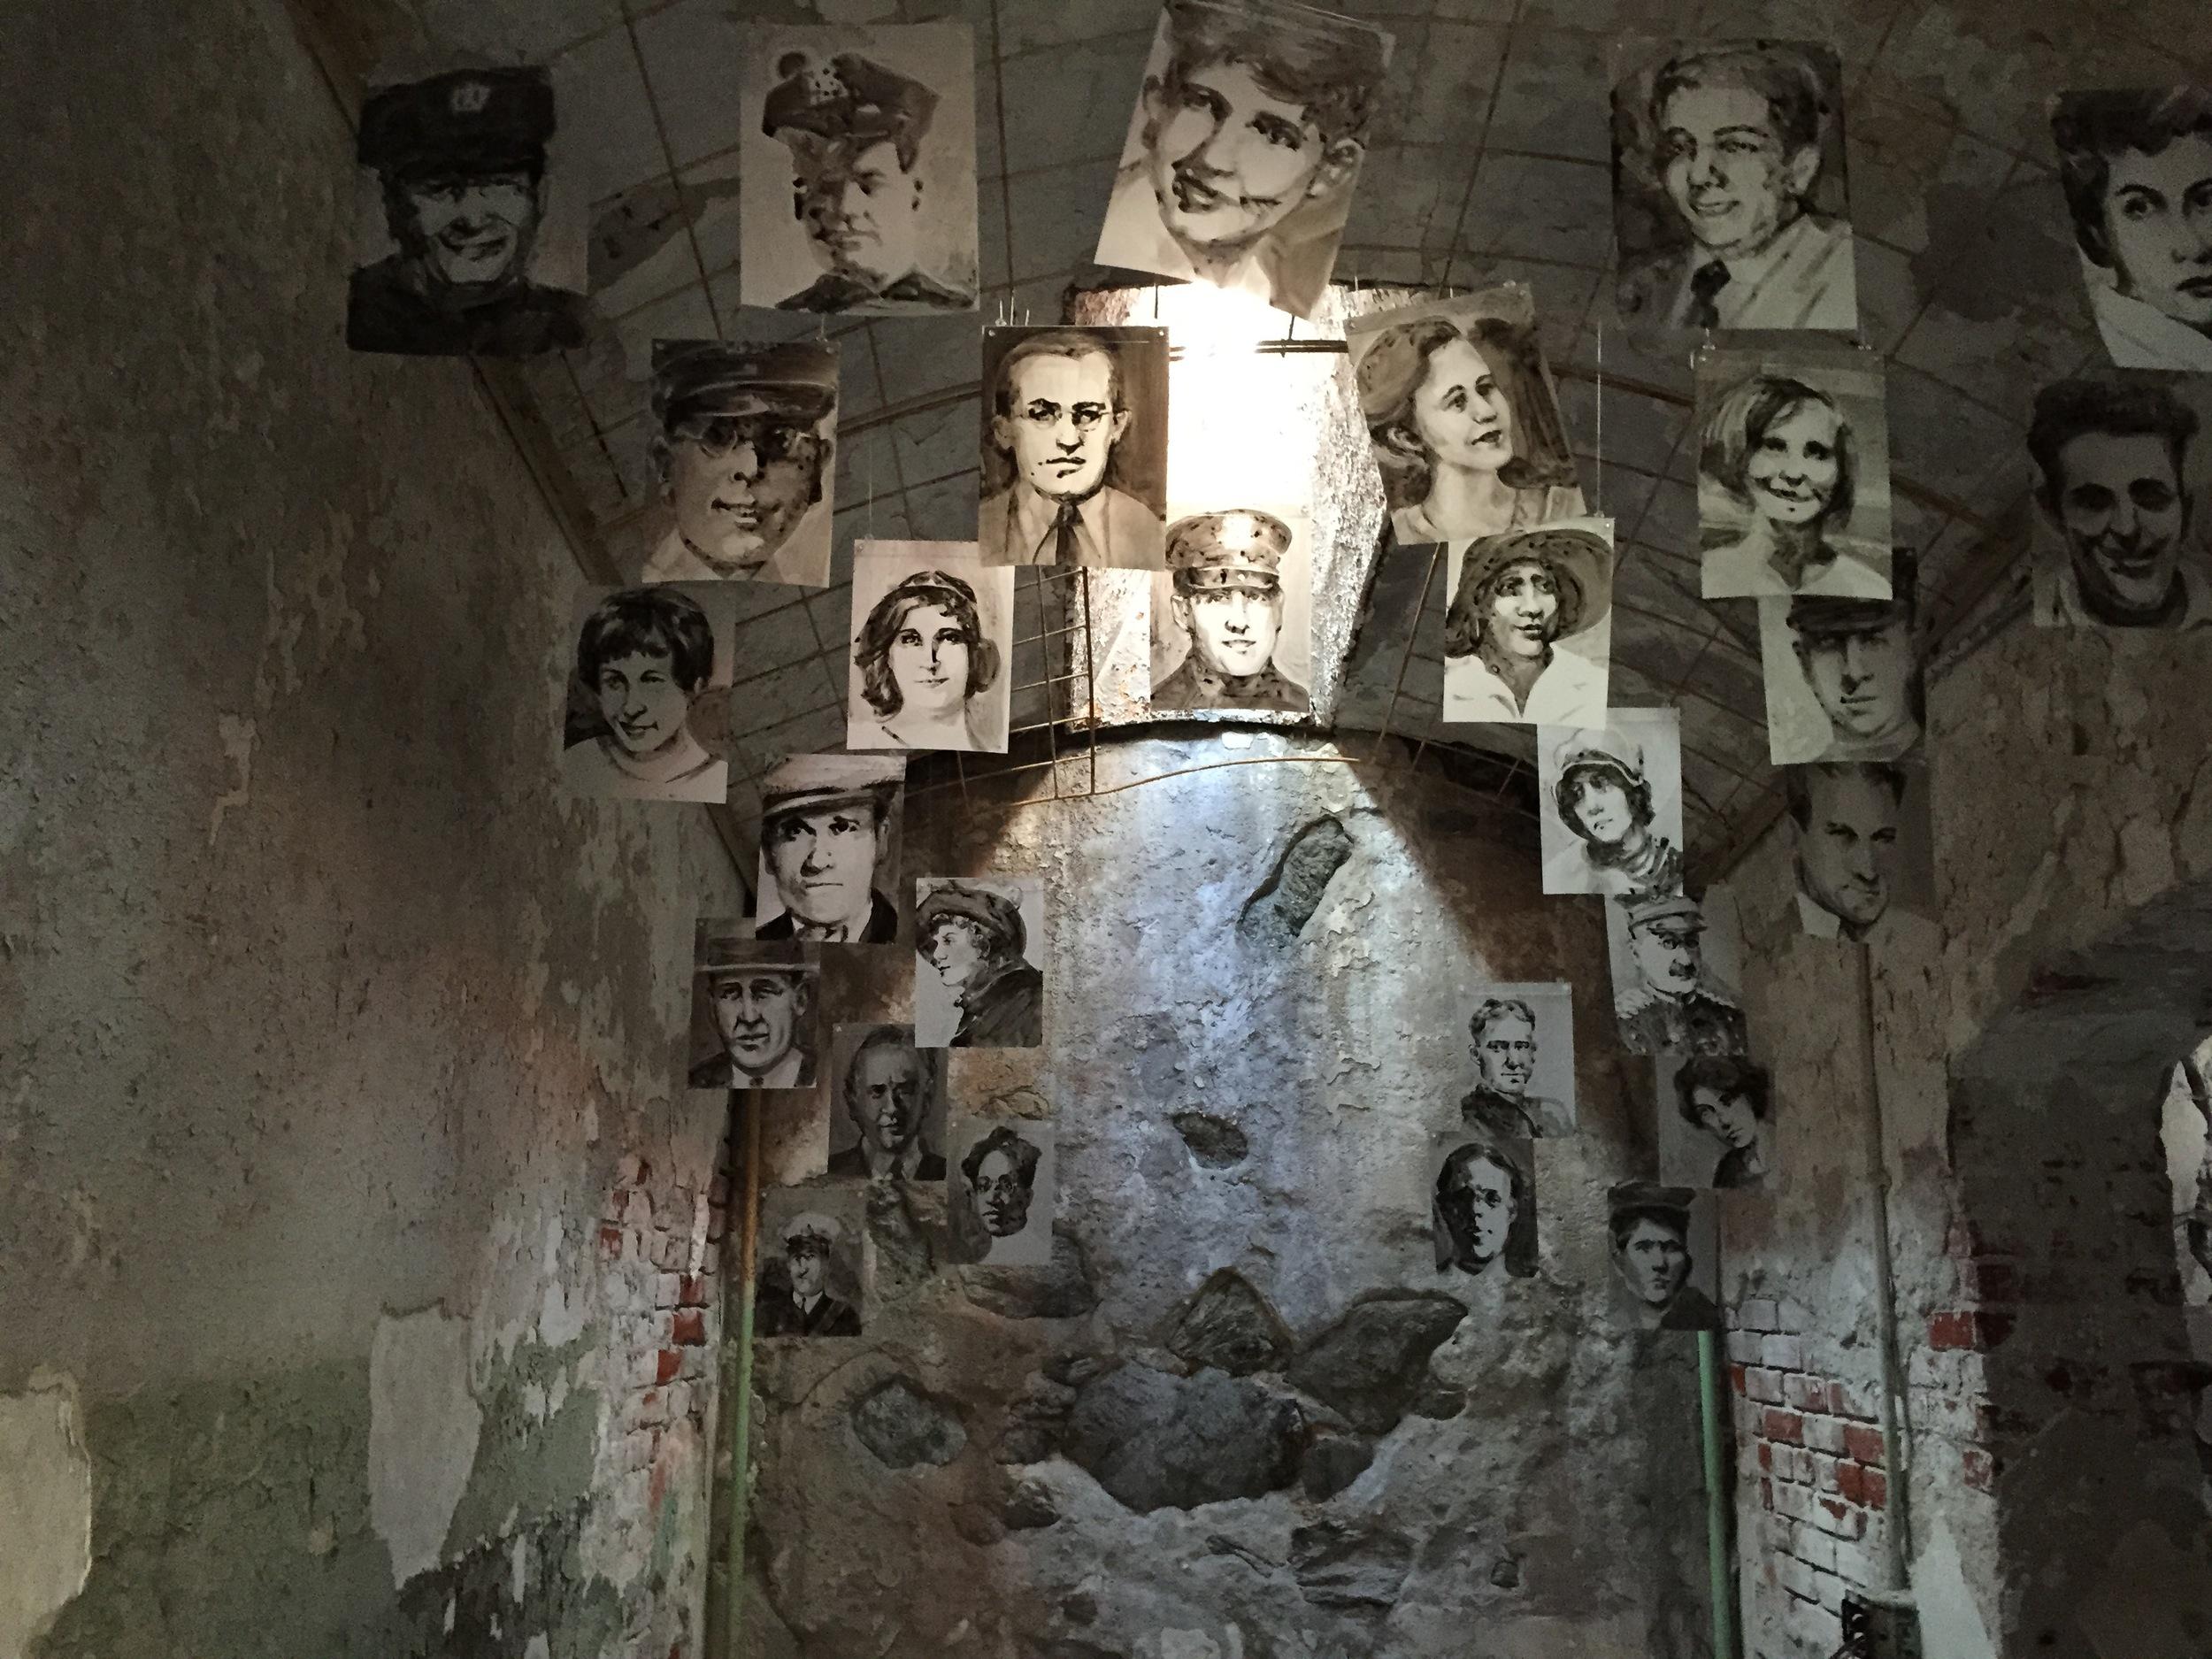 Stories of Victims Exhibit